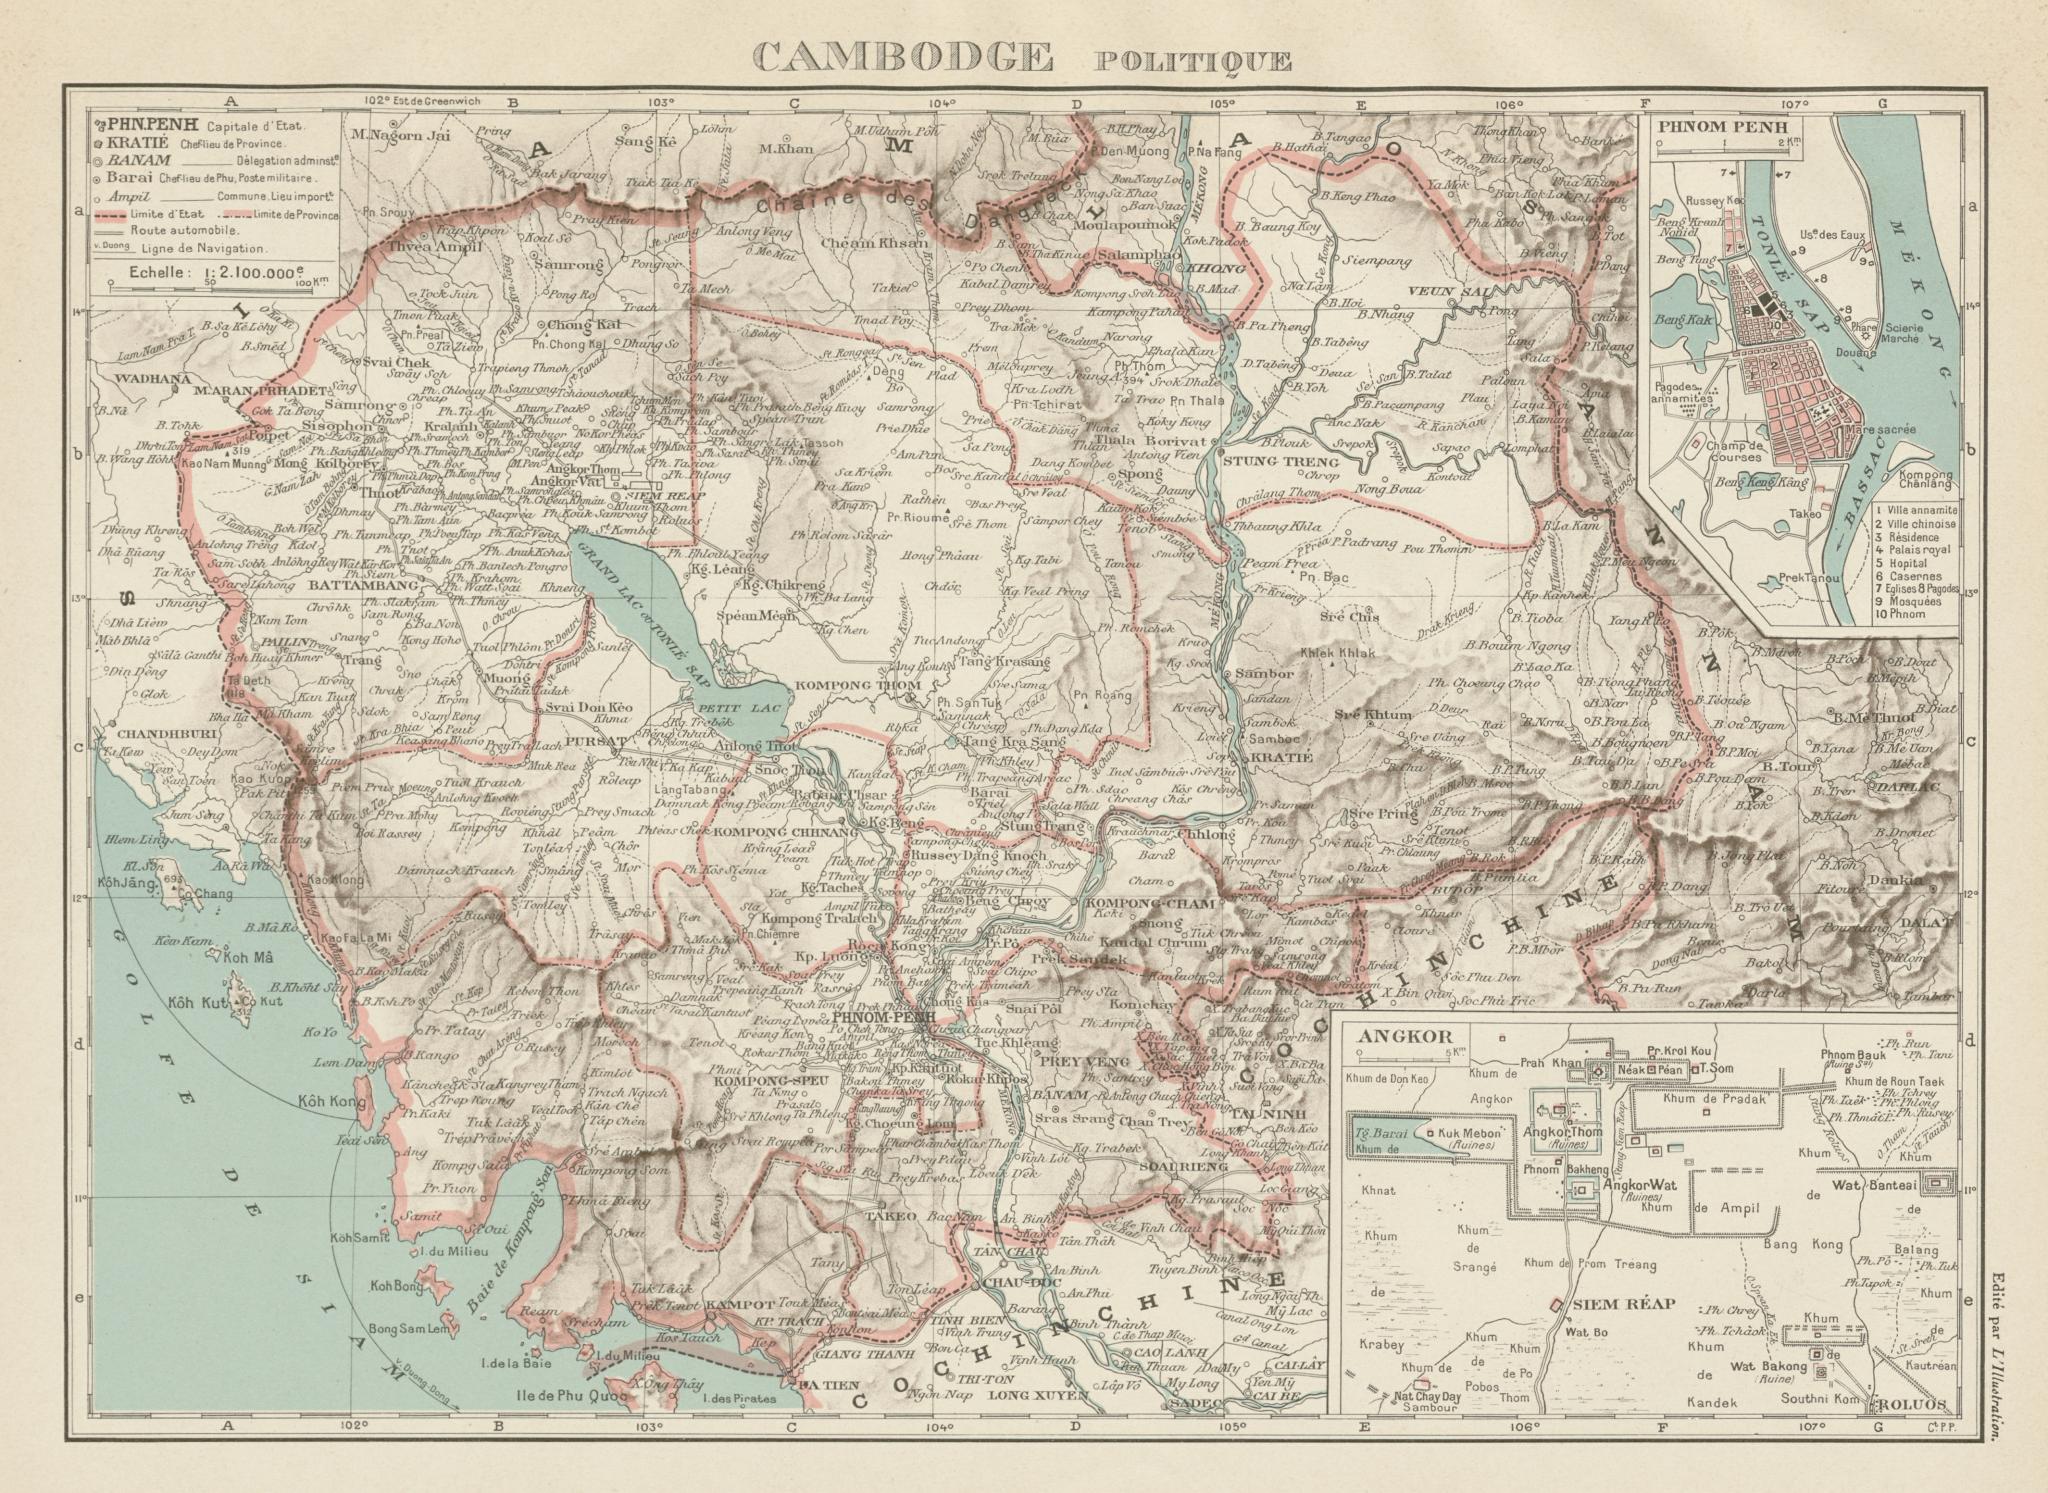 CAMBODIA/Cambodge. French Indochina. Angkor Wat & Phnom Penh plans 1929 map